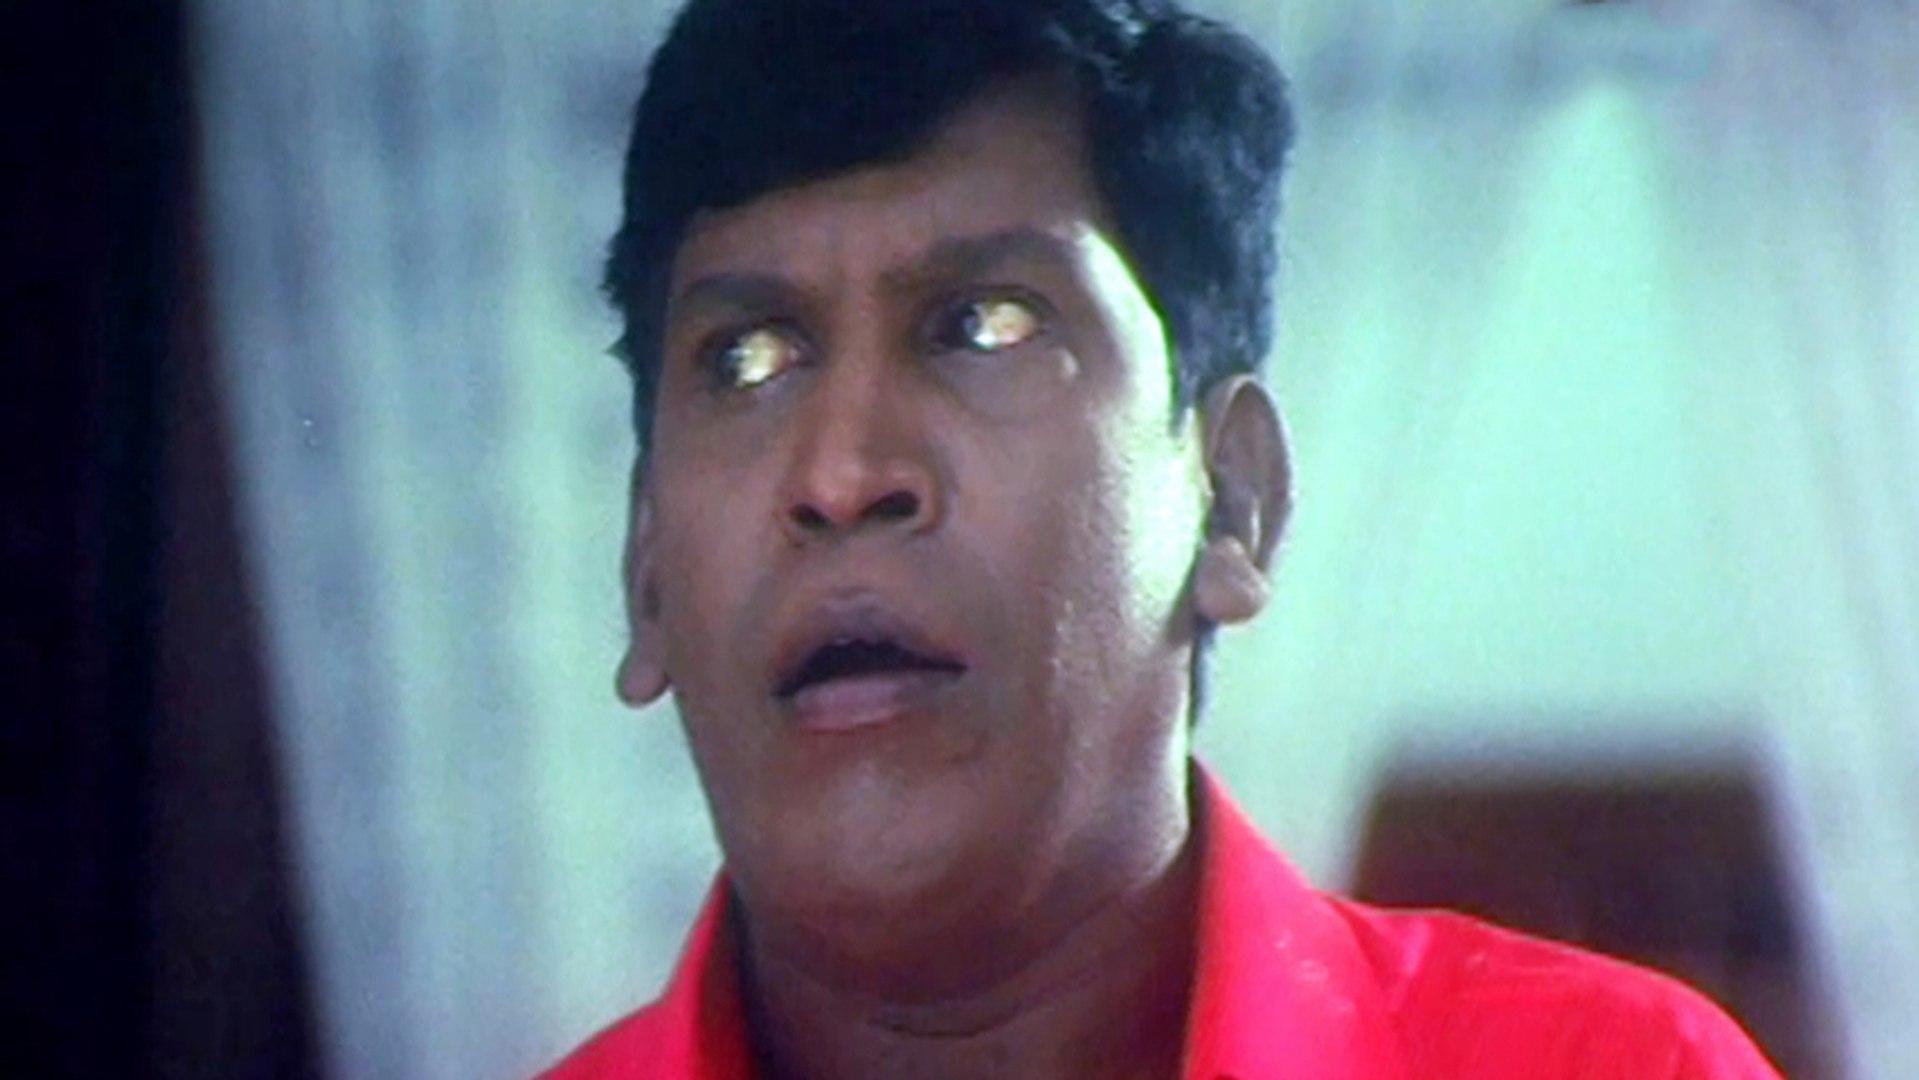 Gudachari No 1 [Arjun] Movie Part-08 - Vadivelu Come To Sarath Babu House And Say He Was The Real Co